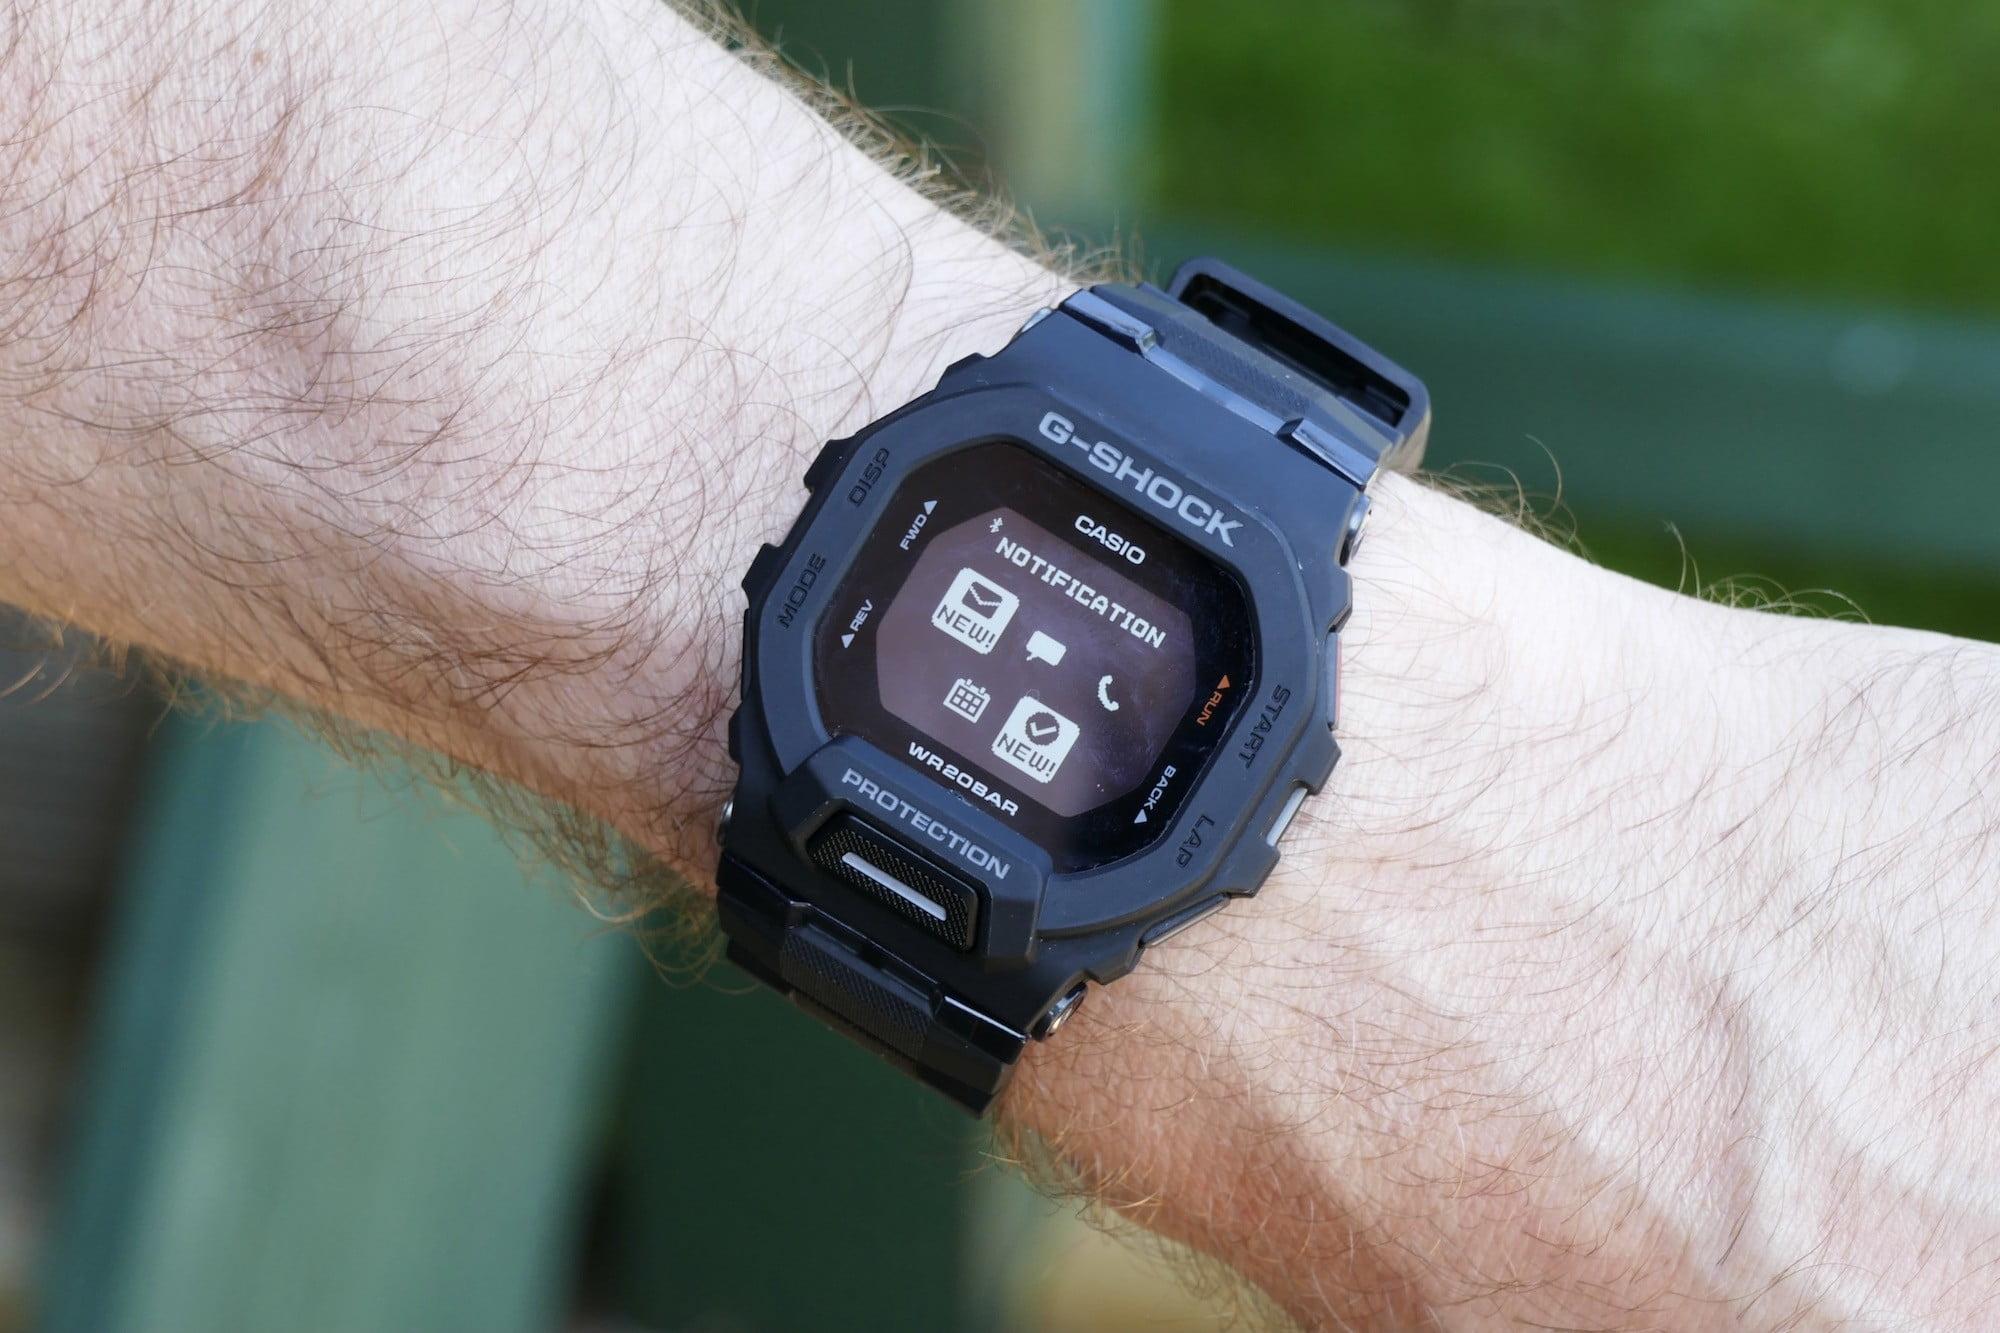 Notification screen on the Casio G-Shock GBD-200.